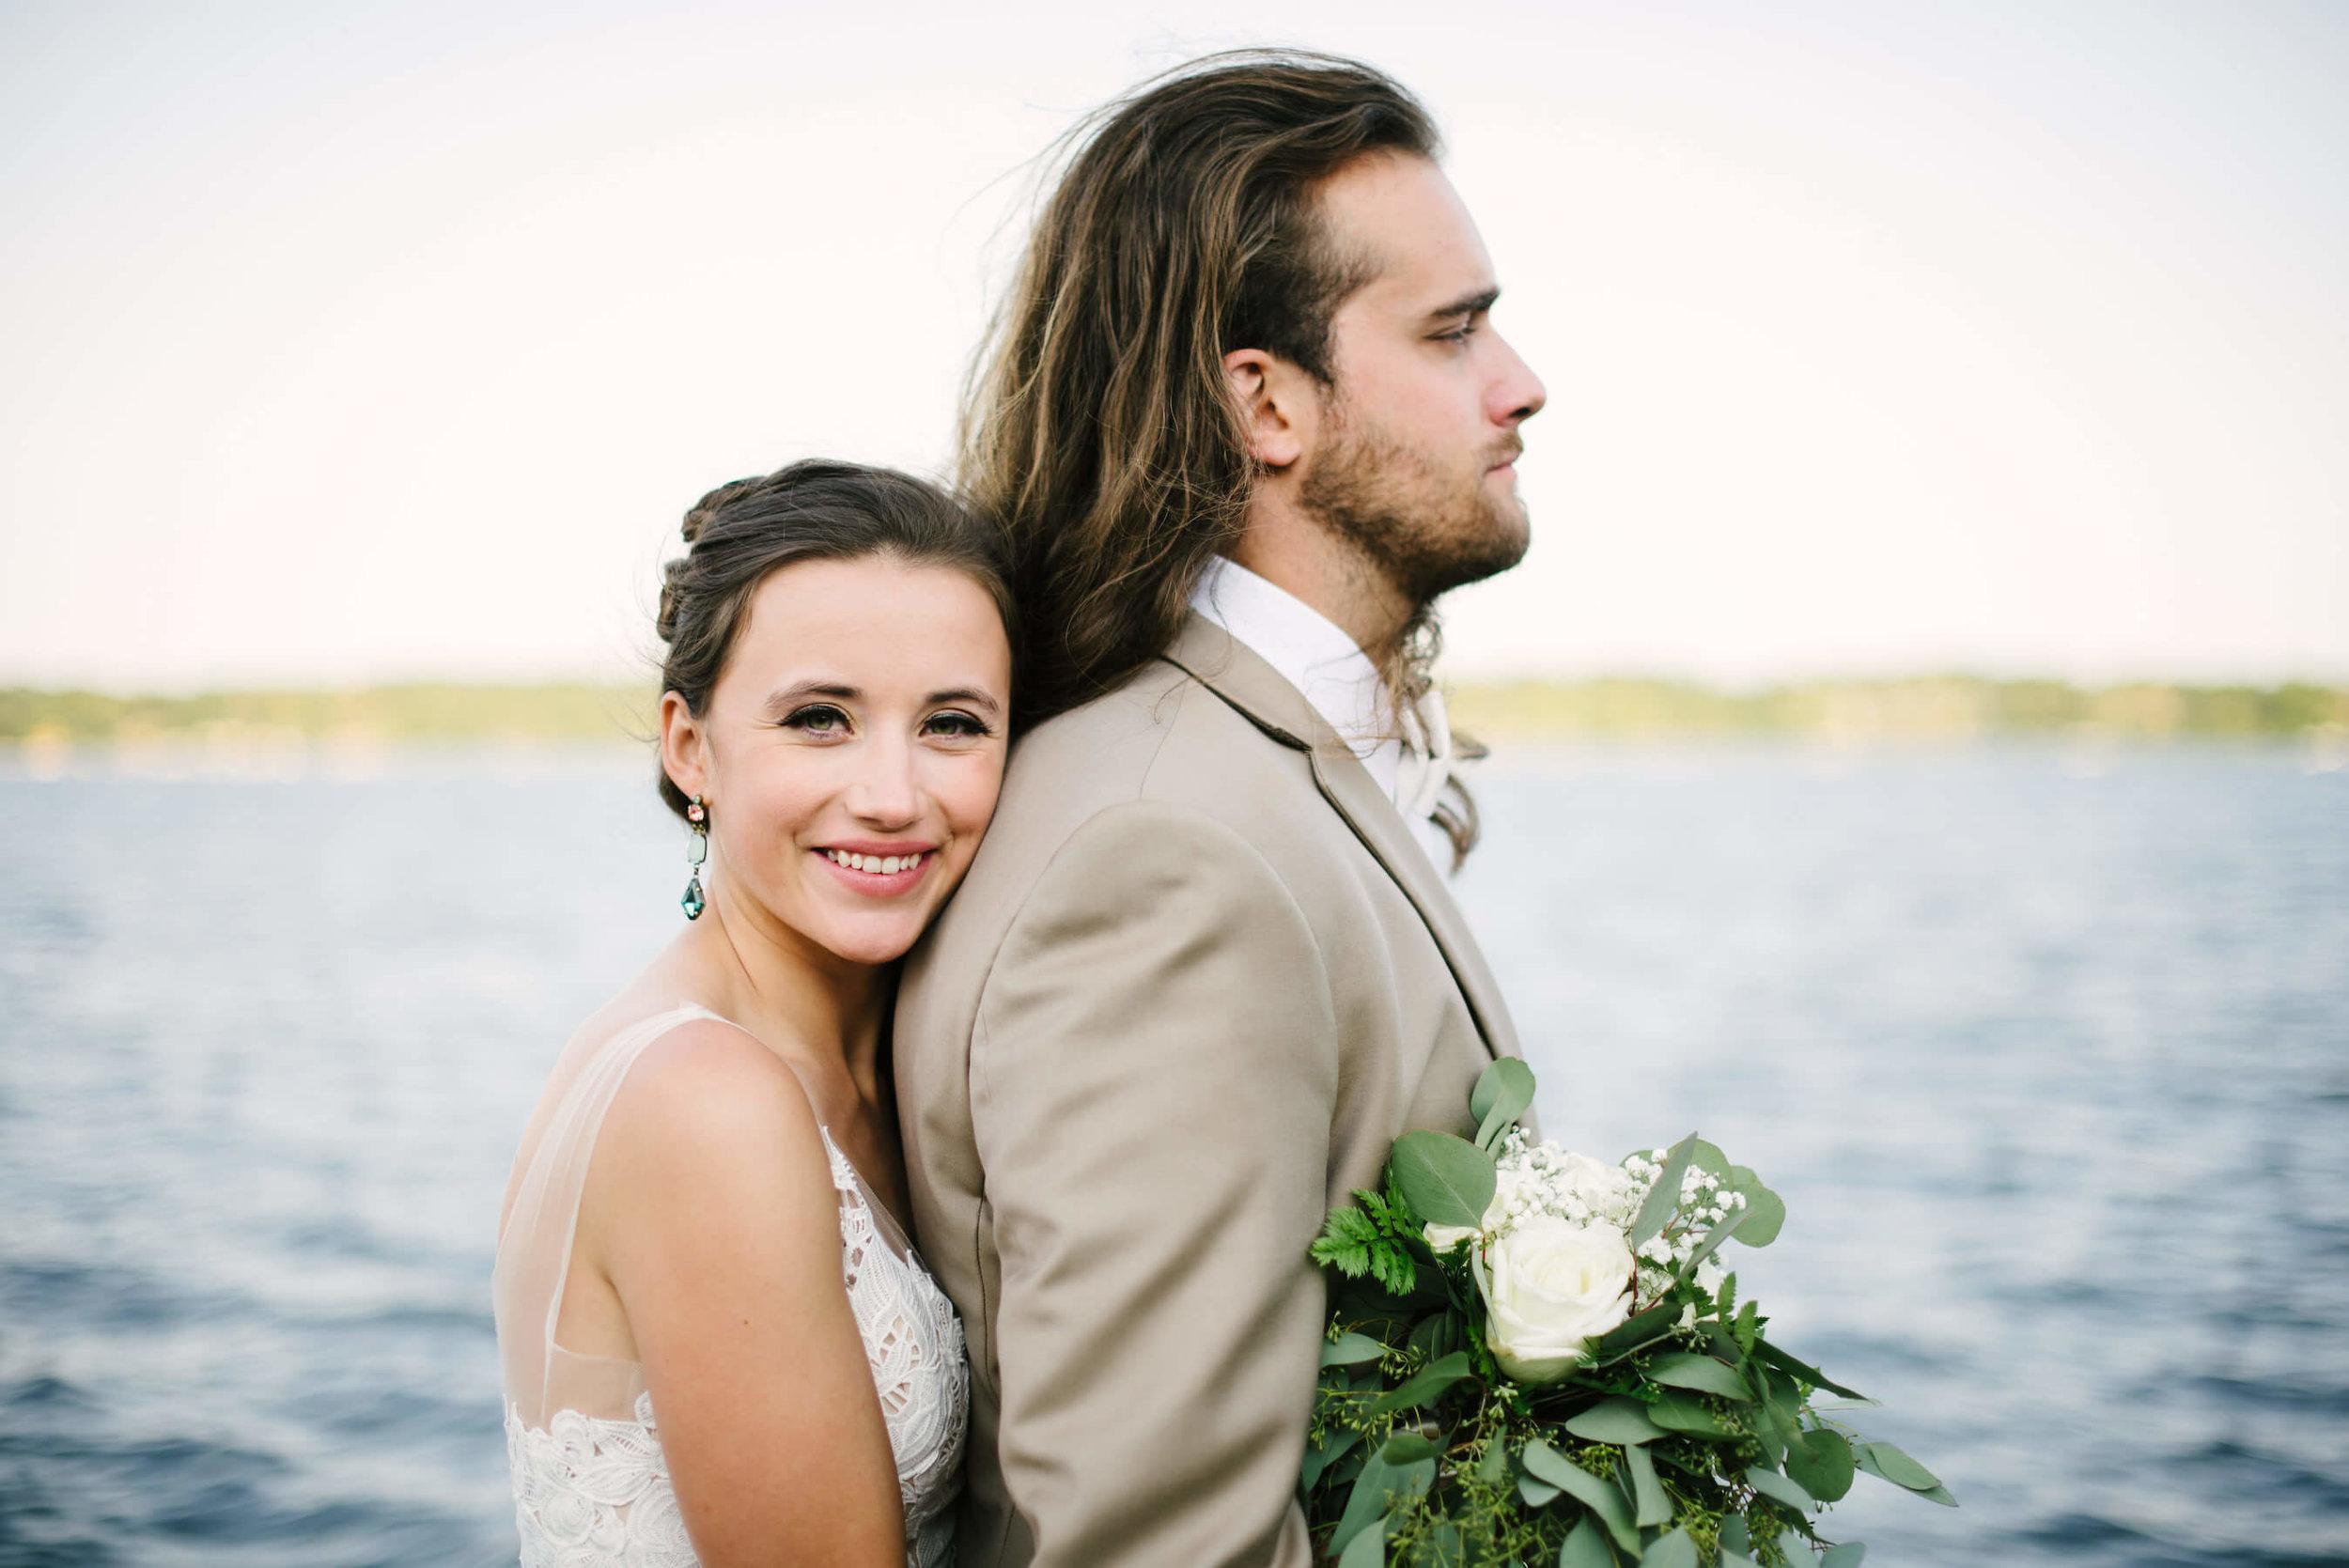 engle-olson-wedding-blair-taylor-35.jpg